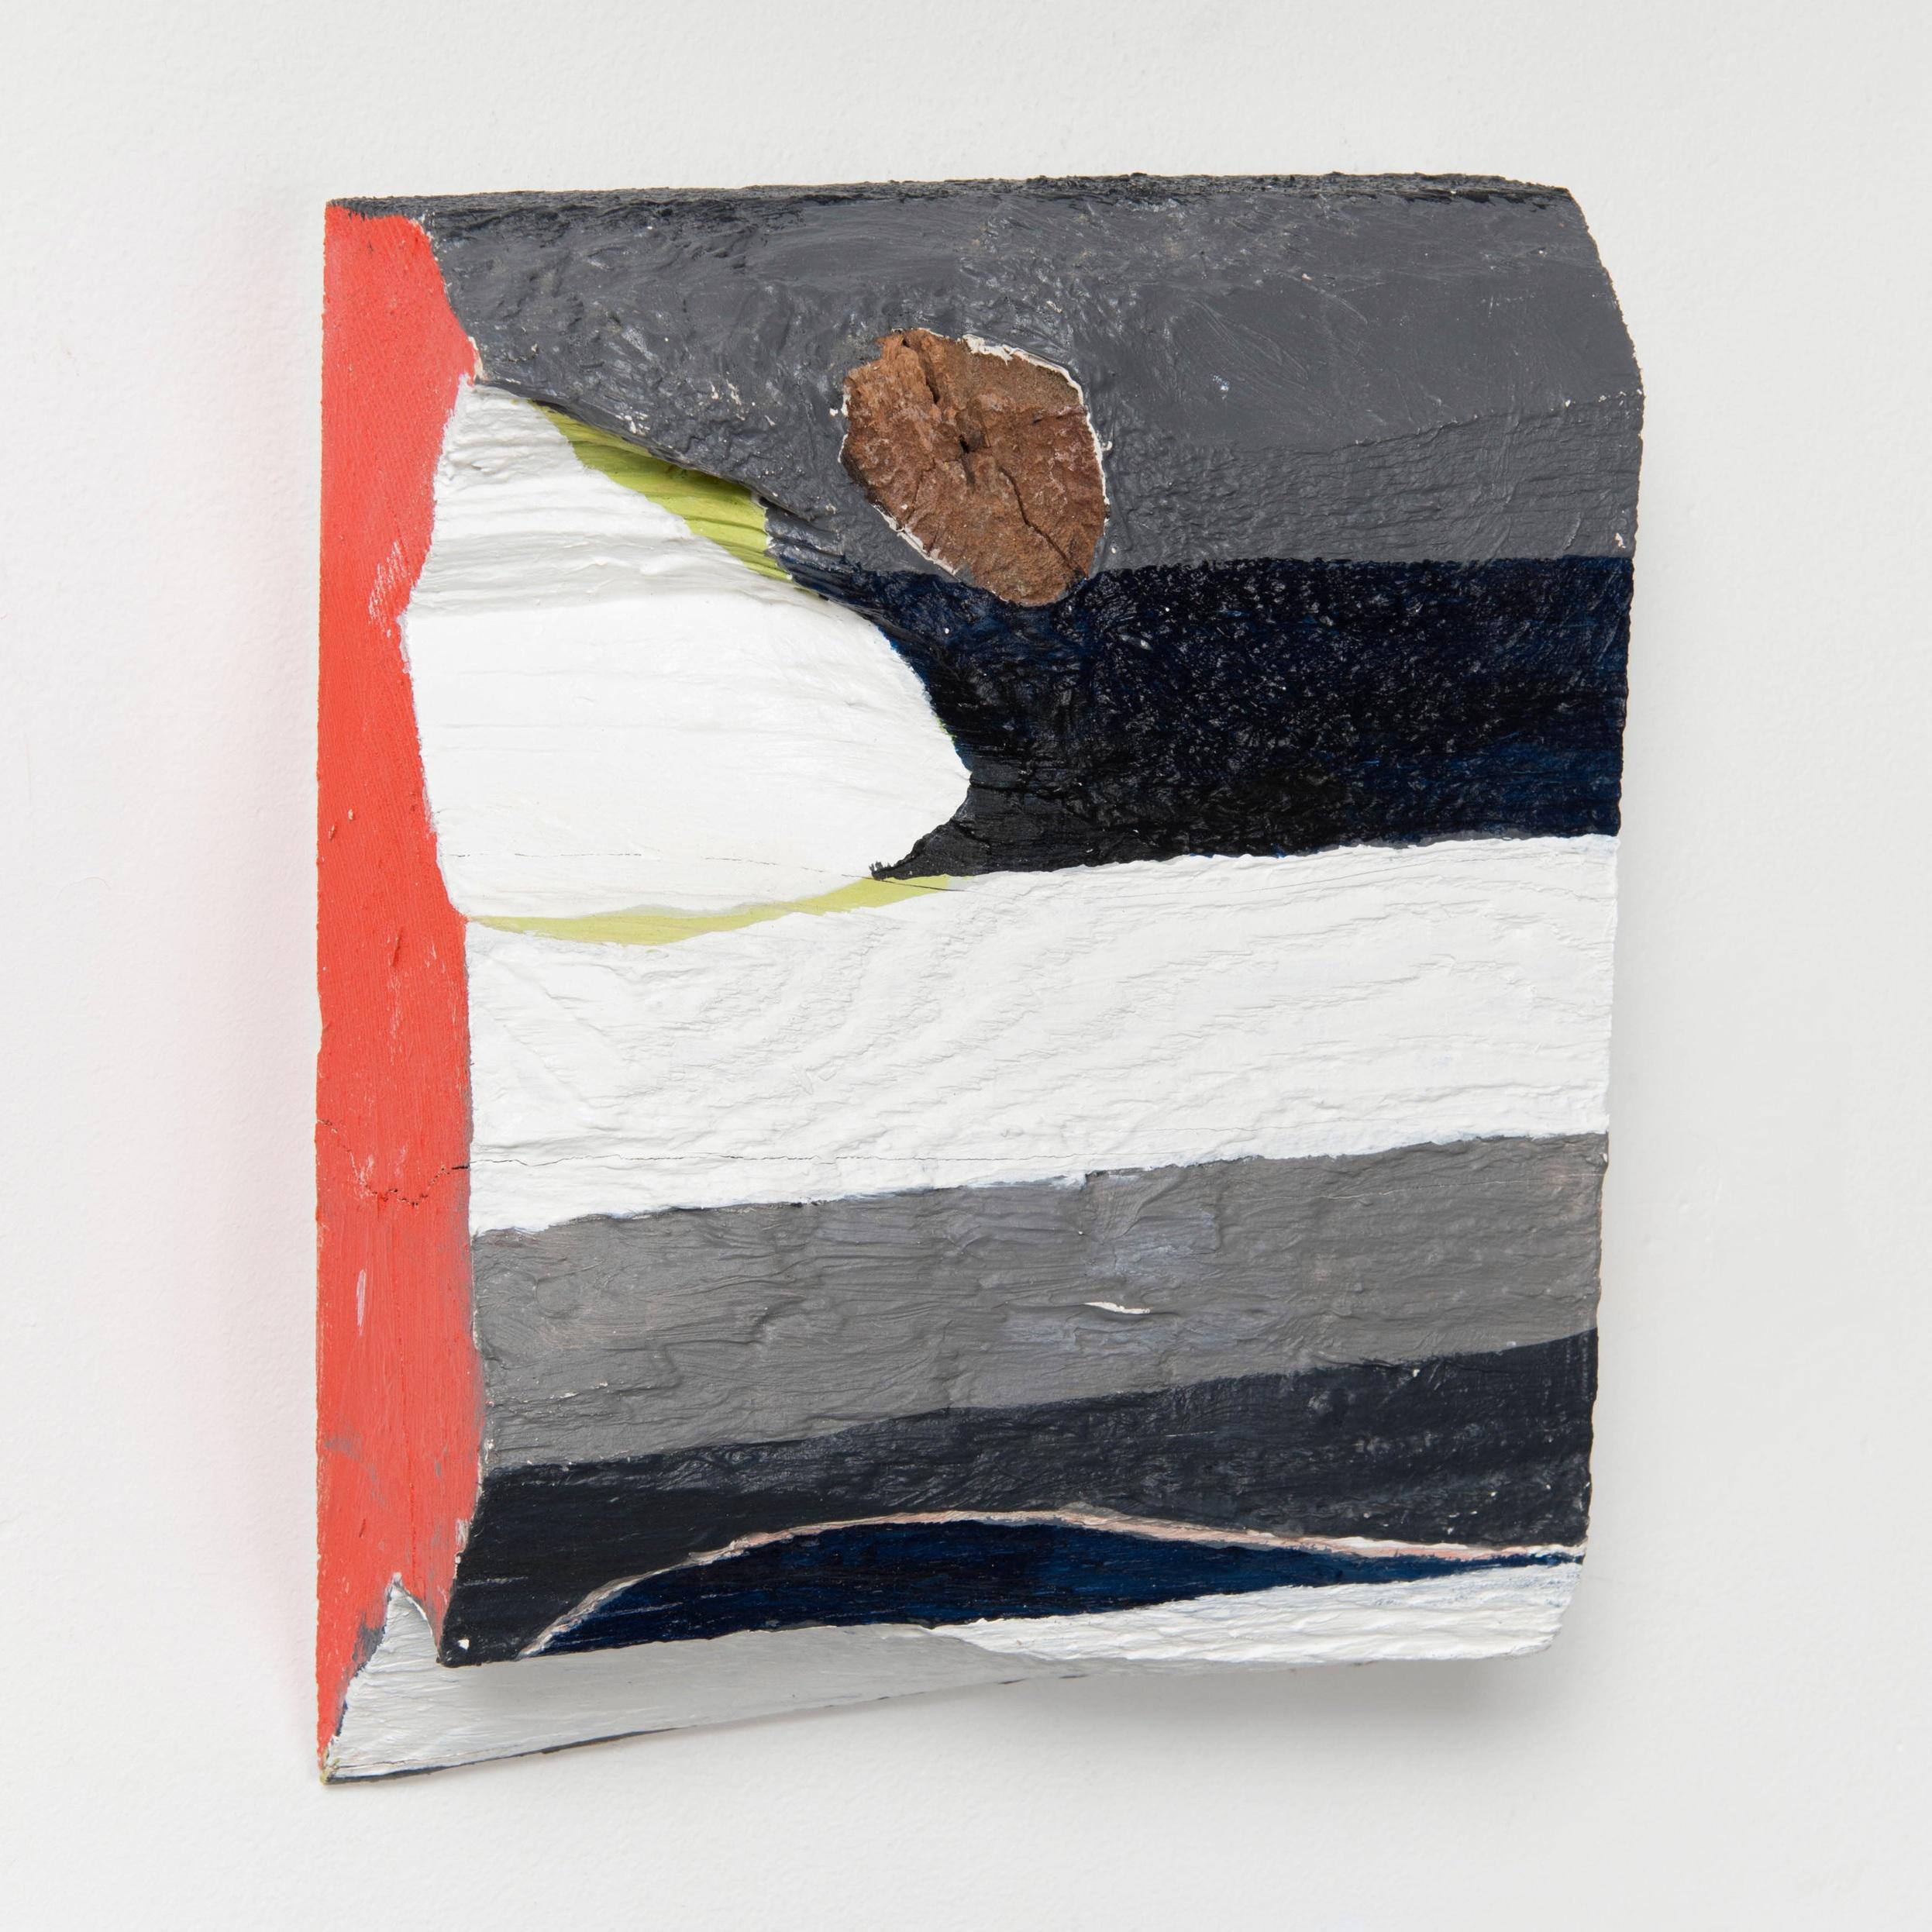 Dark Bars , 2018  Acrylic and enamel on wood  8 3/4 x 7 x 2 1/2 inches